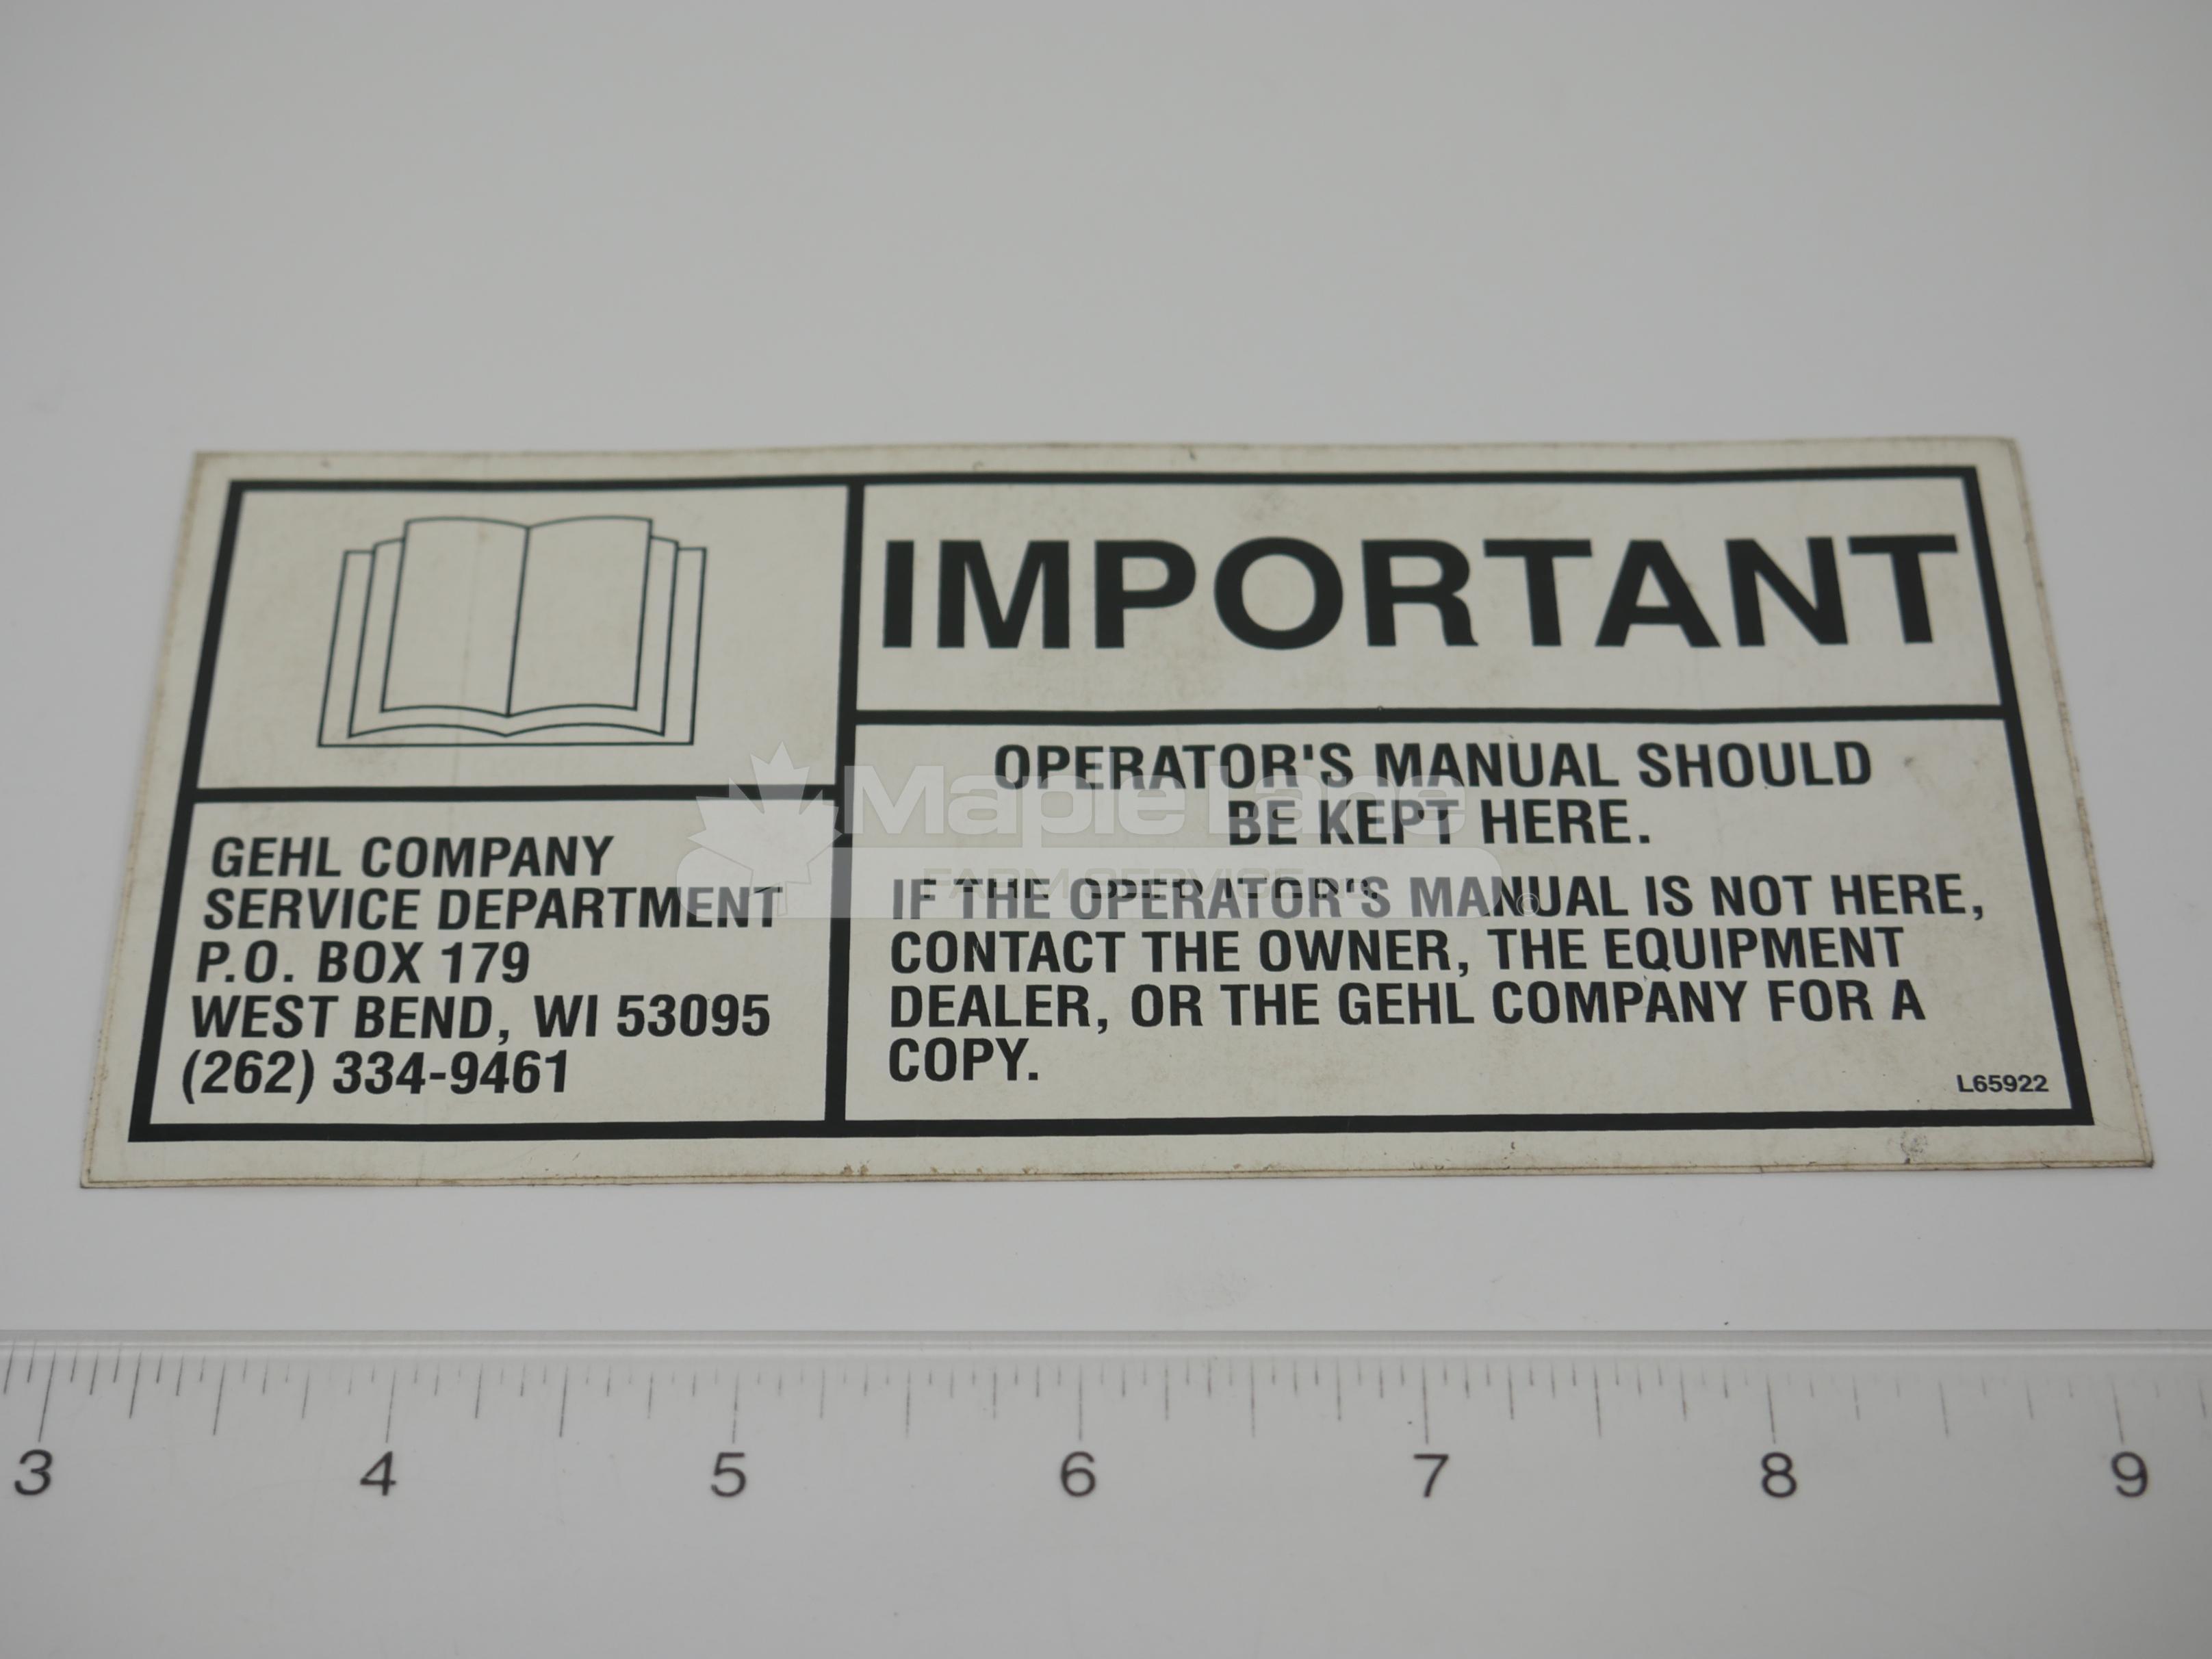 L65922 Operator Manual Decal